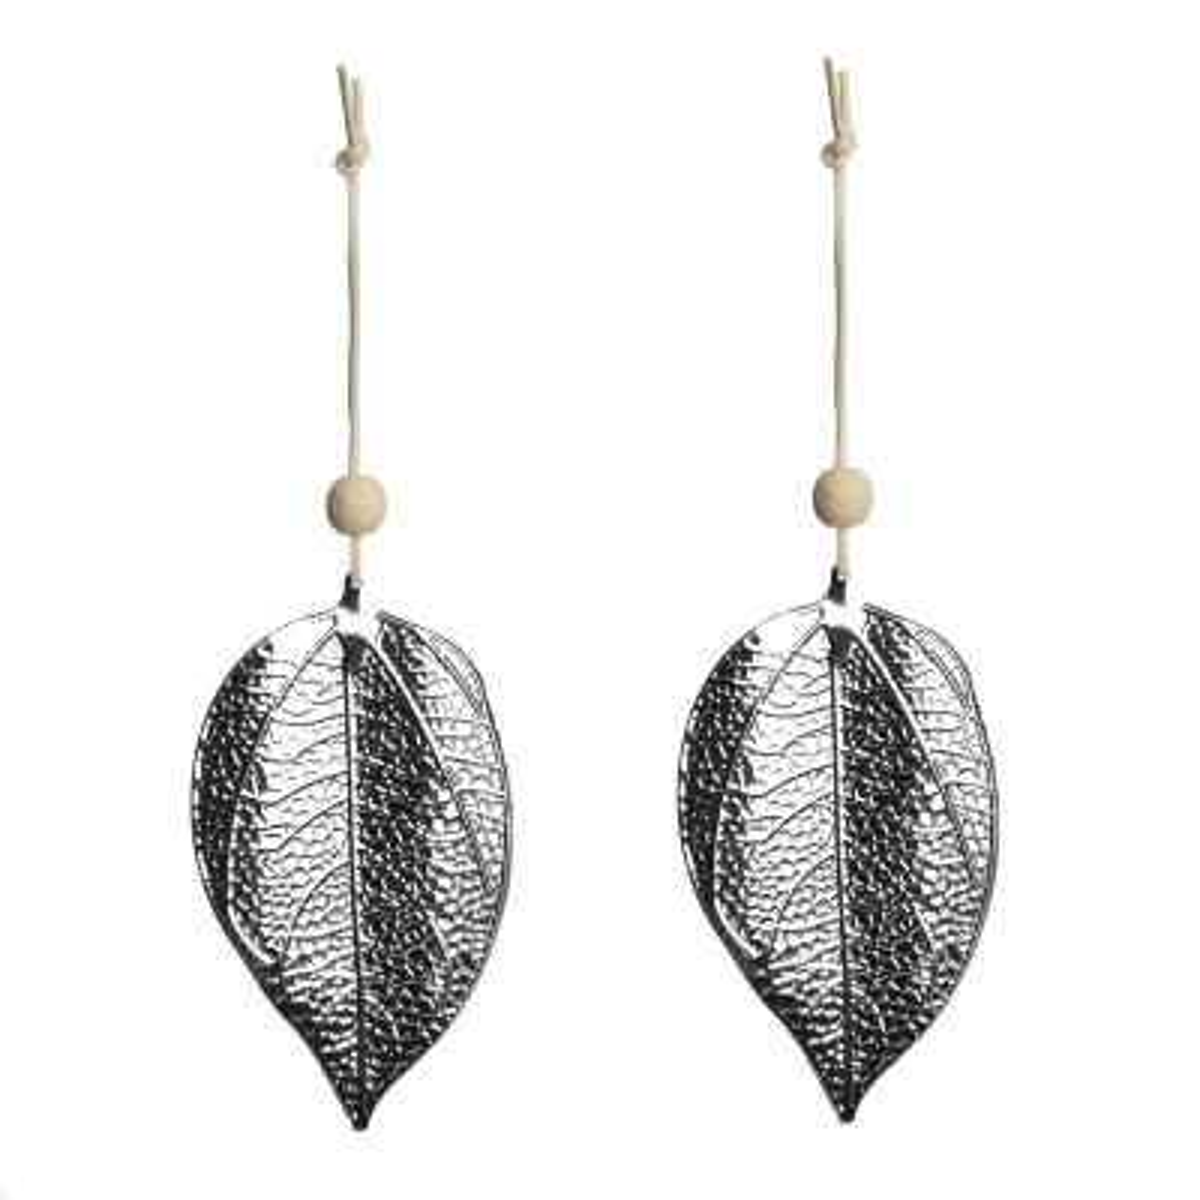 Silver Pressed Metal Hanging Leaf Christmas Decoration - Set of 2